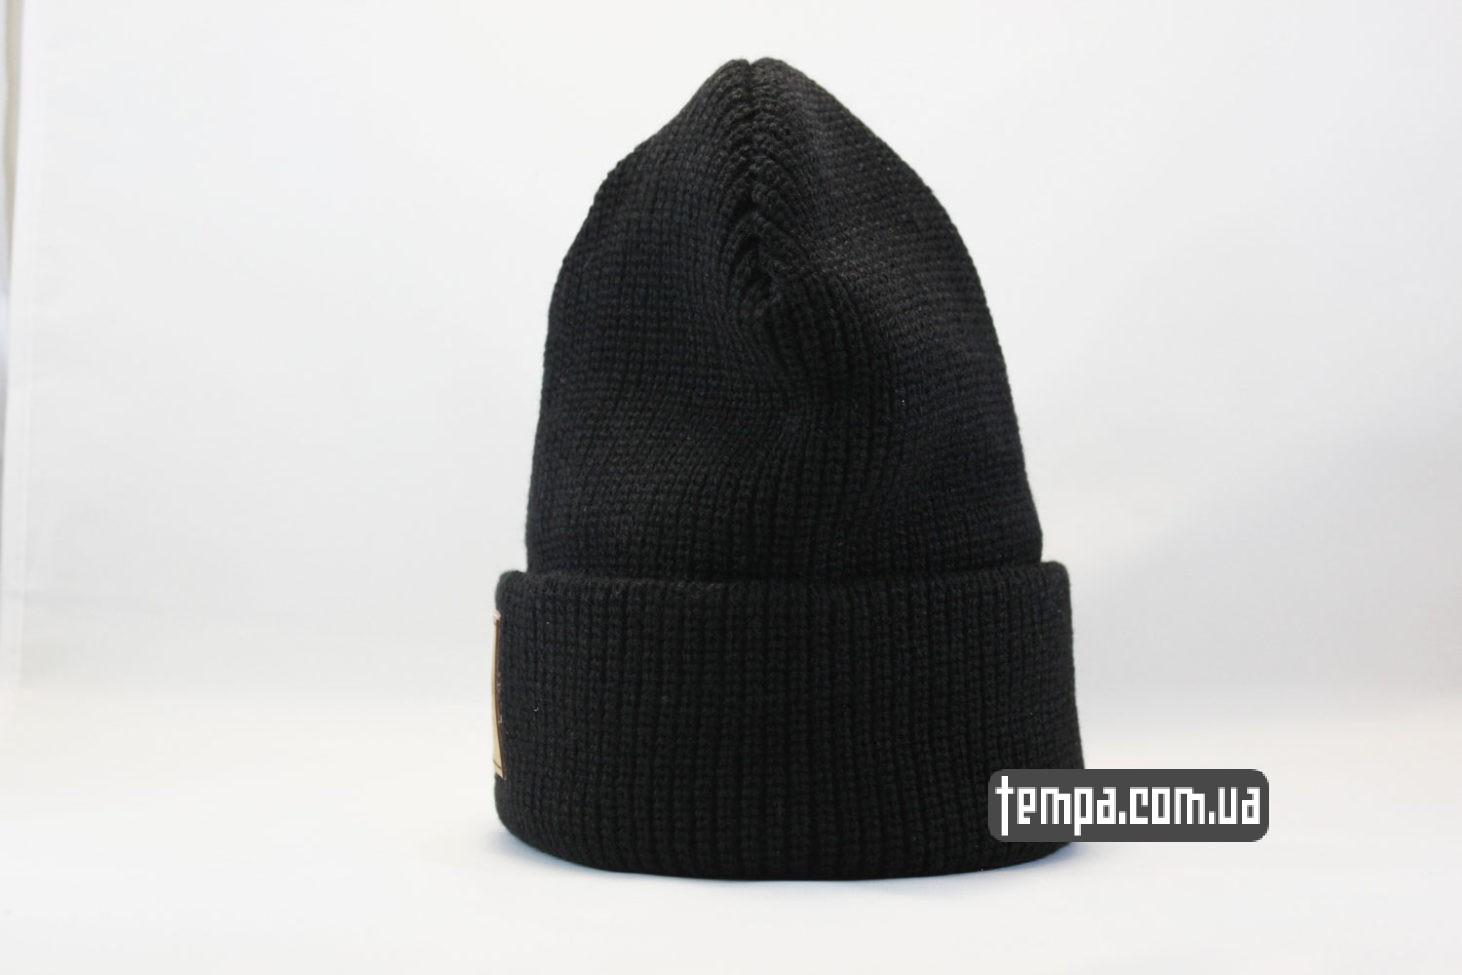 стасси Украина оригинал шапка beanie STUSSY New York Los Angeles Tokyo купить магазин Украина